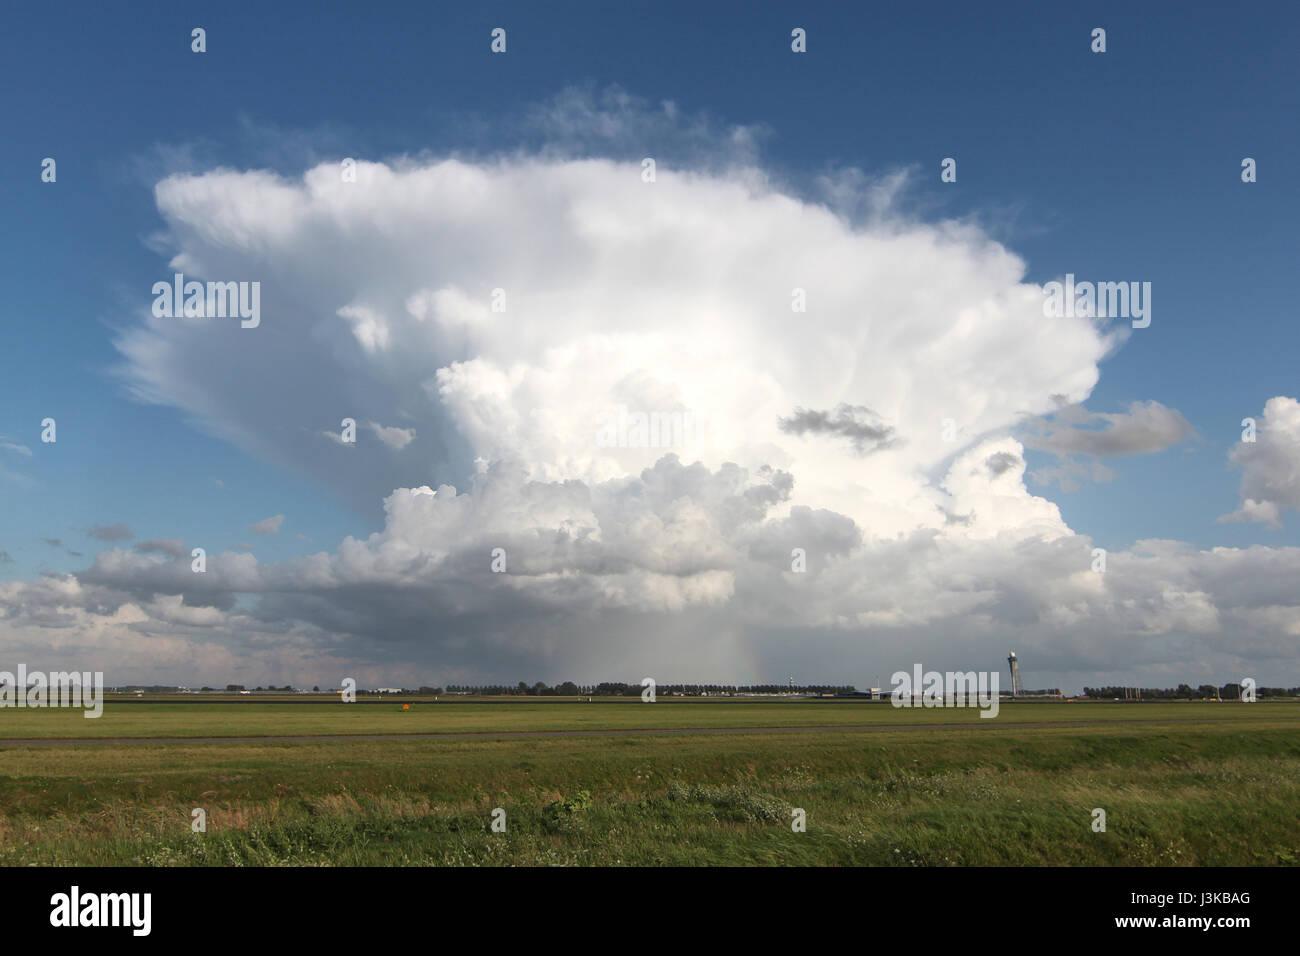 Cumulonimbus capillatus above airport - Stock Image